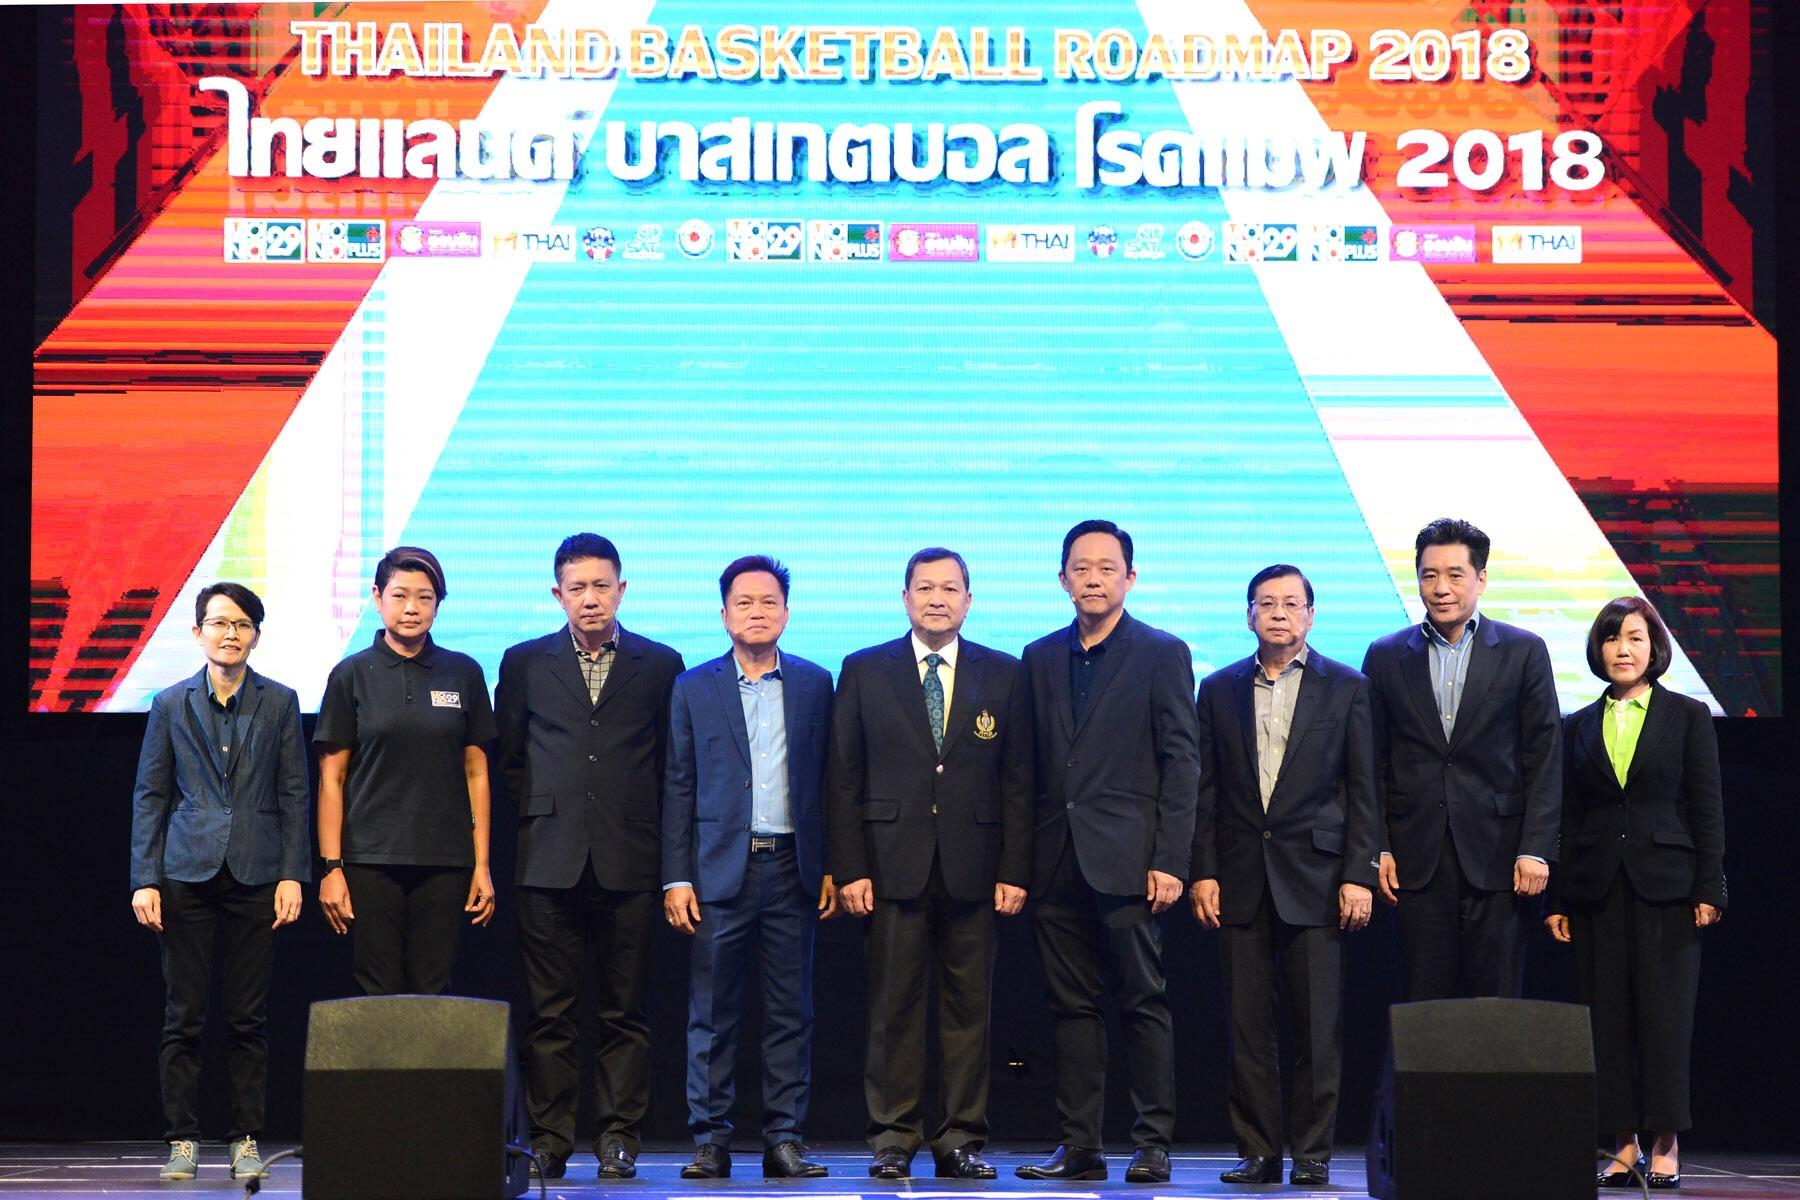 Thailand Basketball Road Map 2018